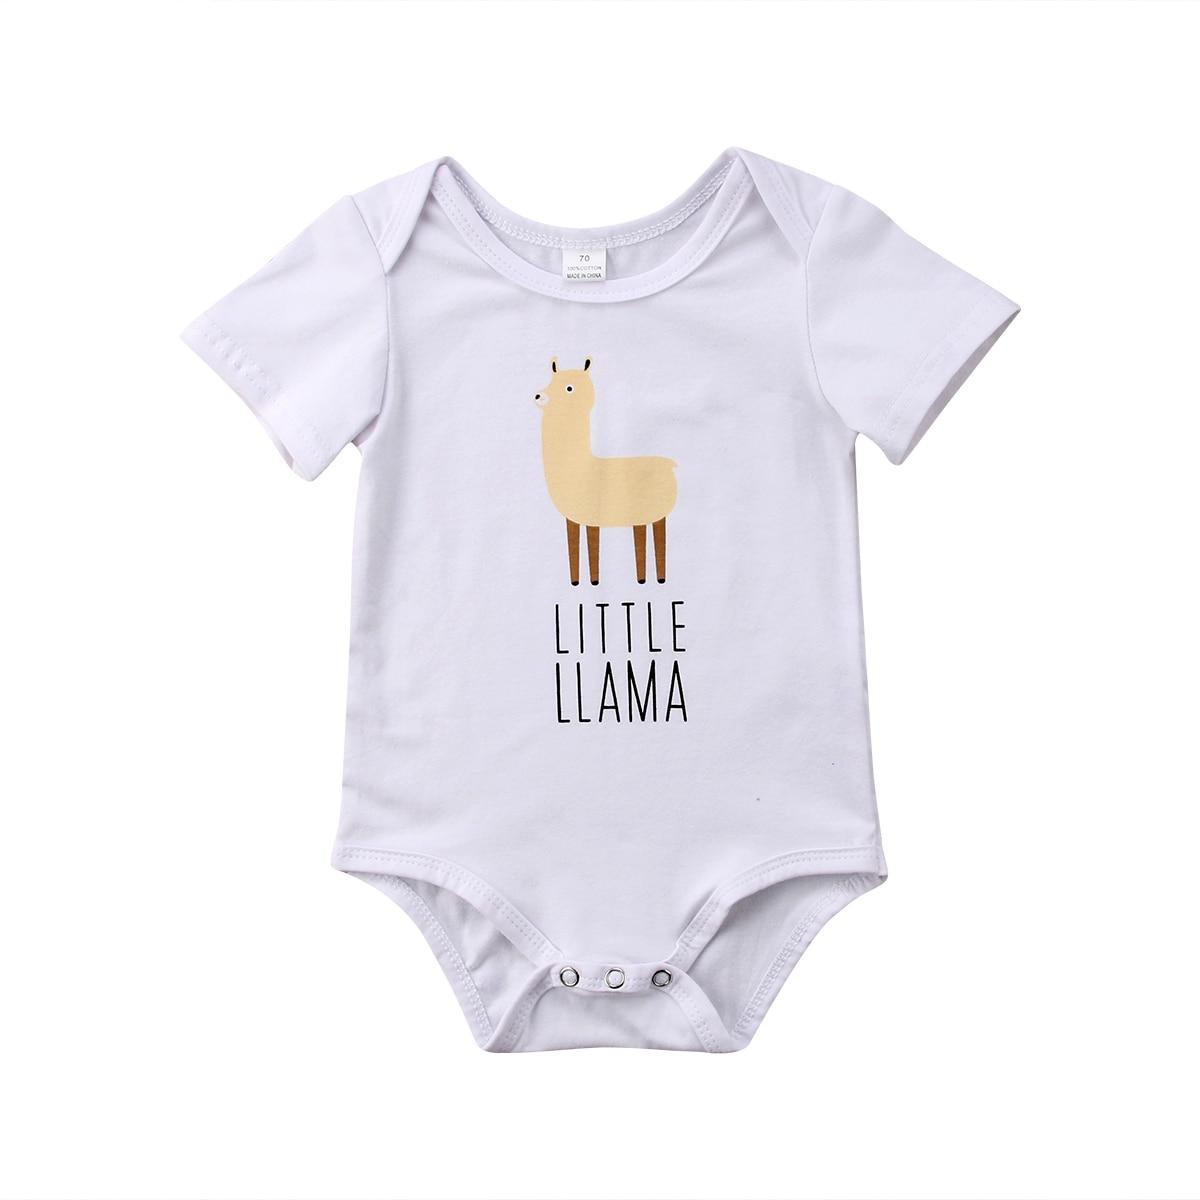 Newborn Kids Baby Boy Girl Llama Bodysuit Playsuit Summer Cartoon Clothes Outfits